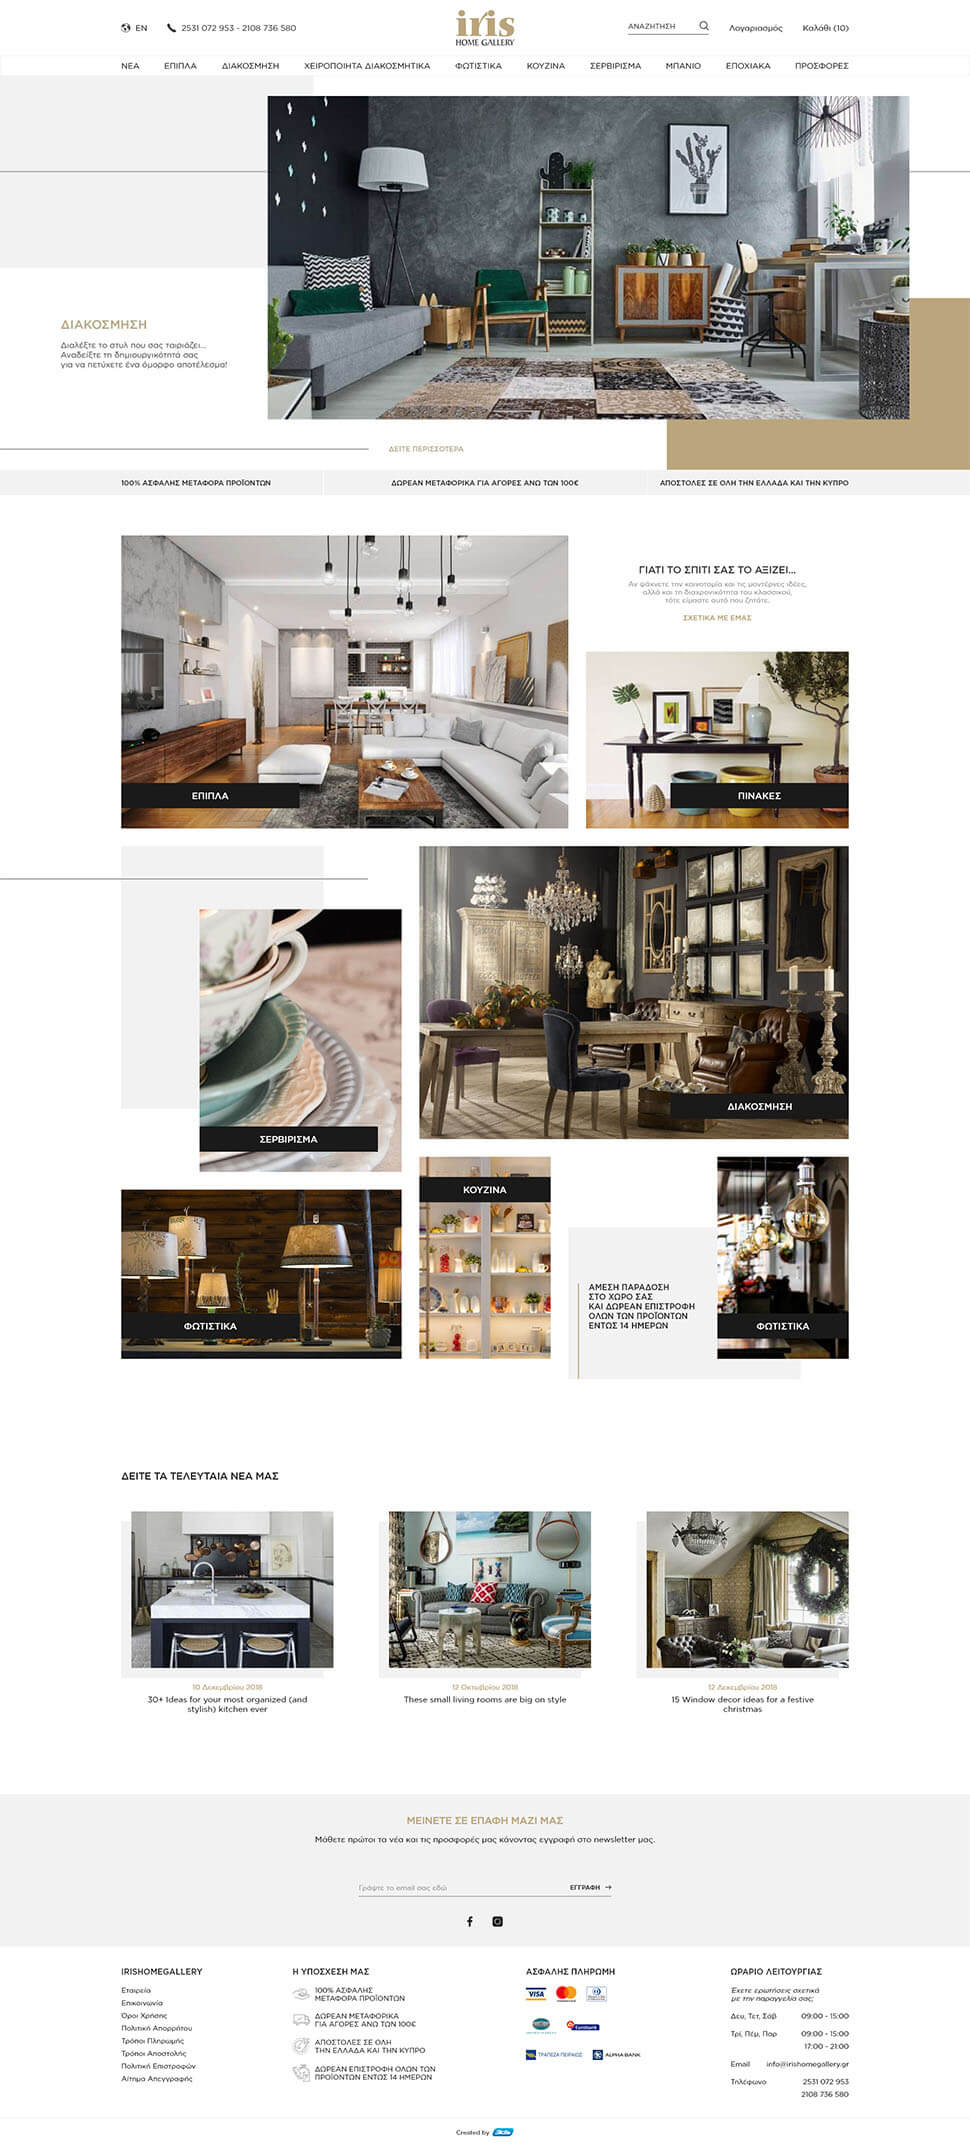 Iris Home Gallery